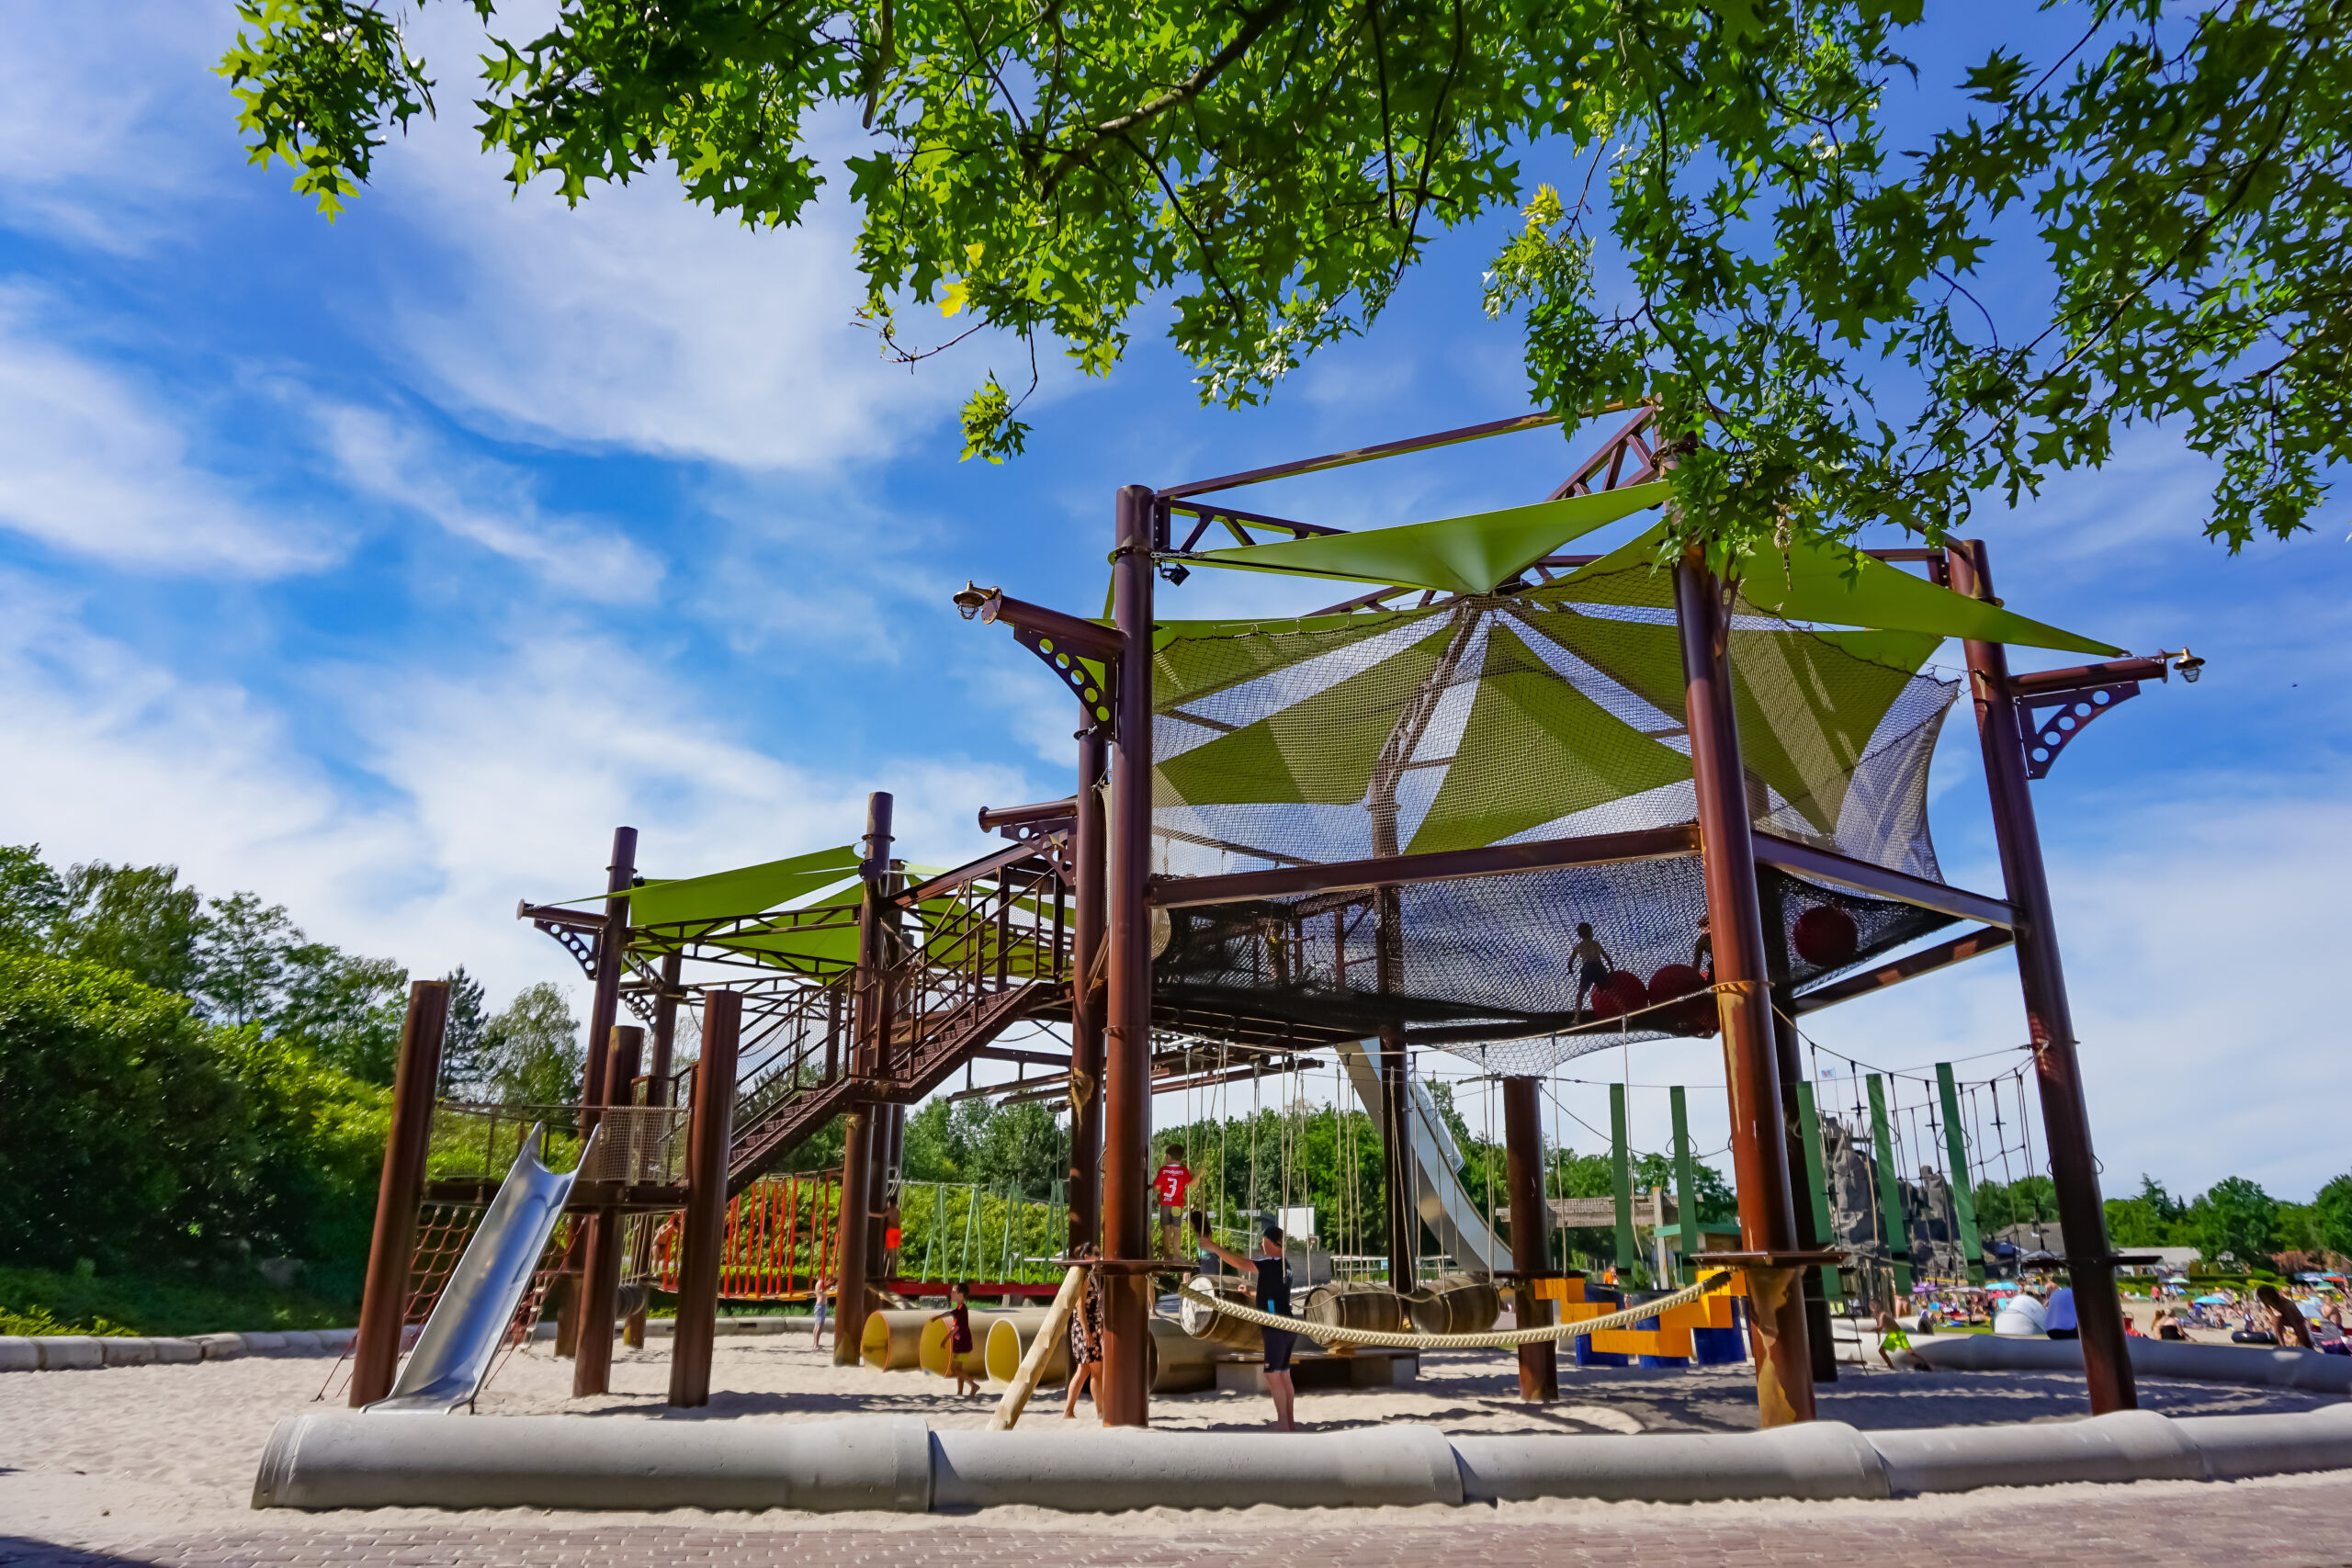 Klimpark zonder personeel